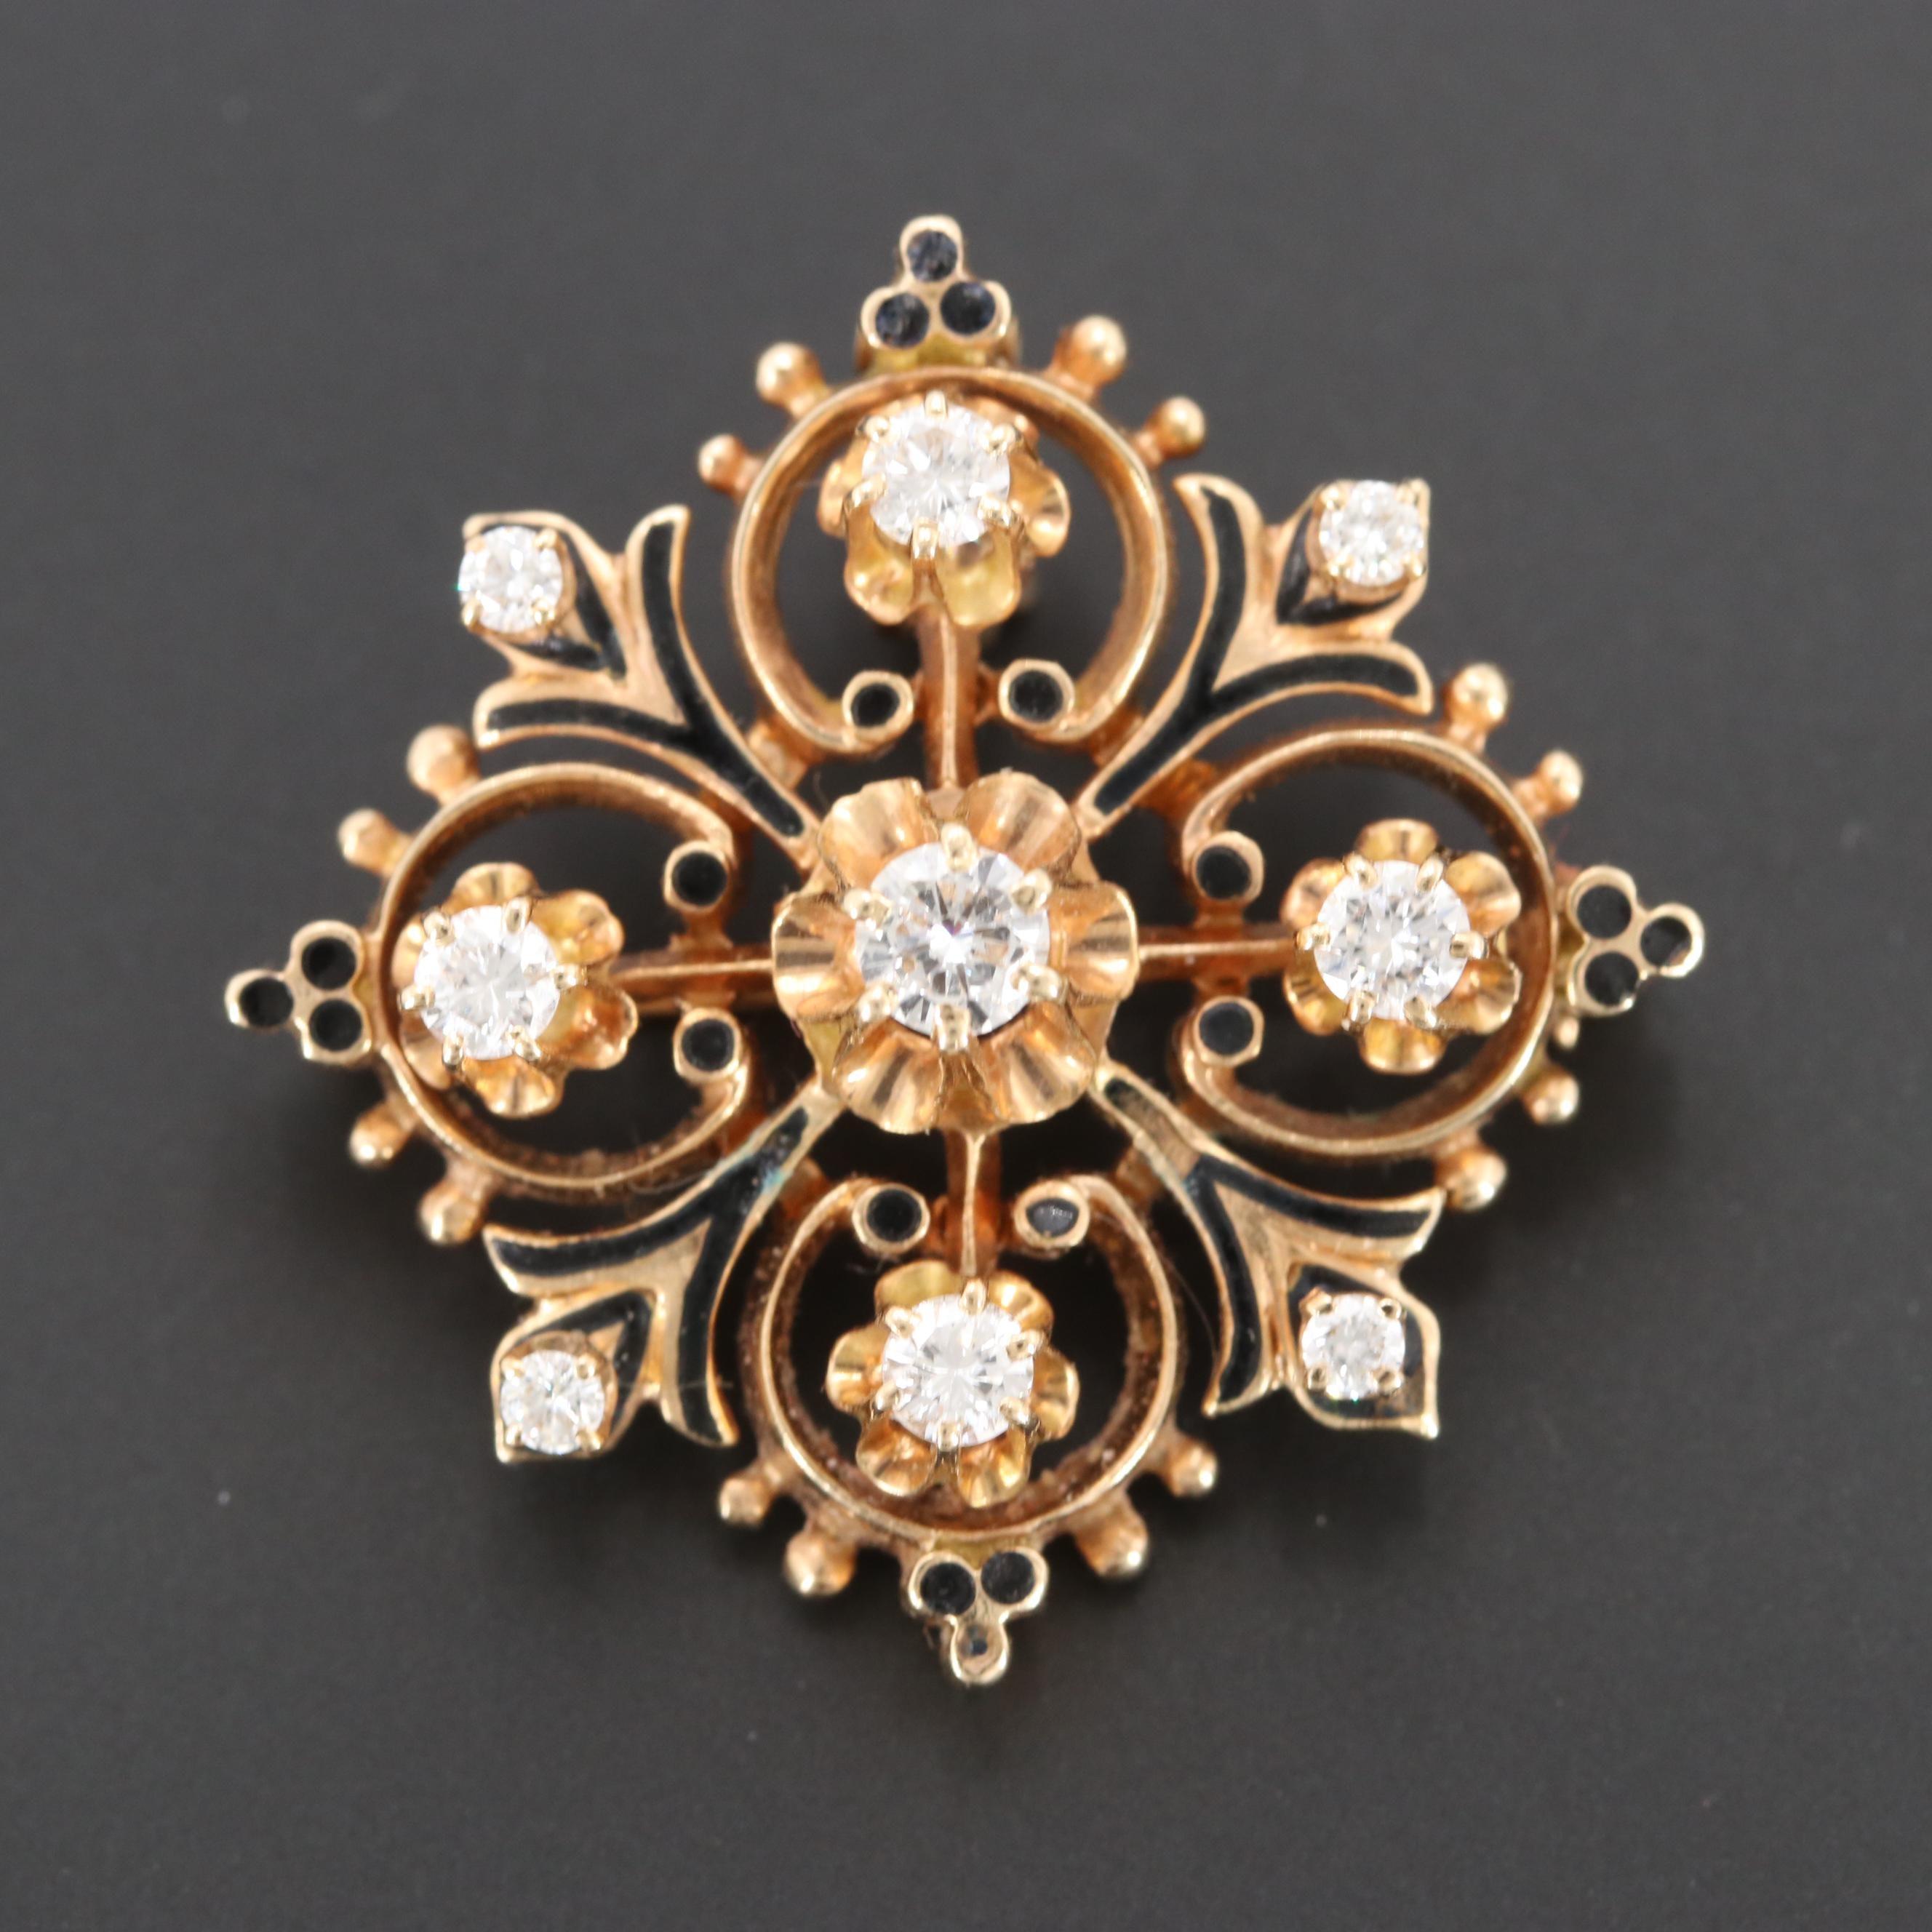 Victorian 14K Yellow Gold Diamond Converter Brooch